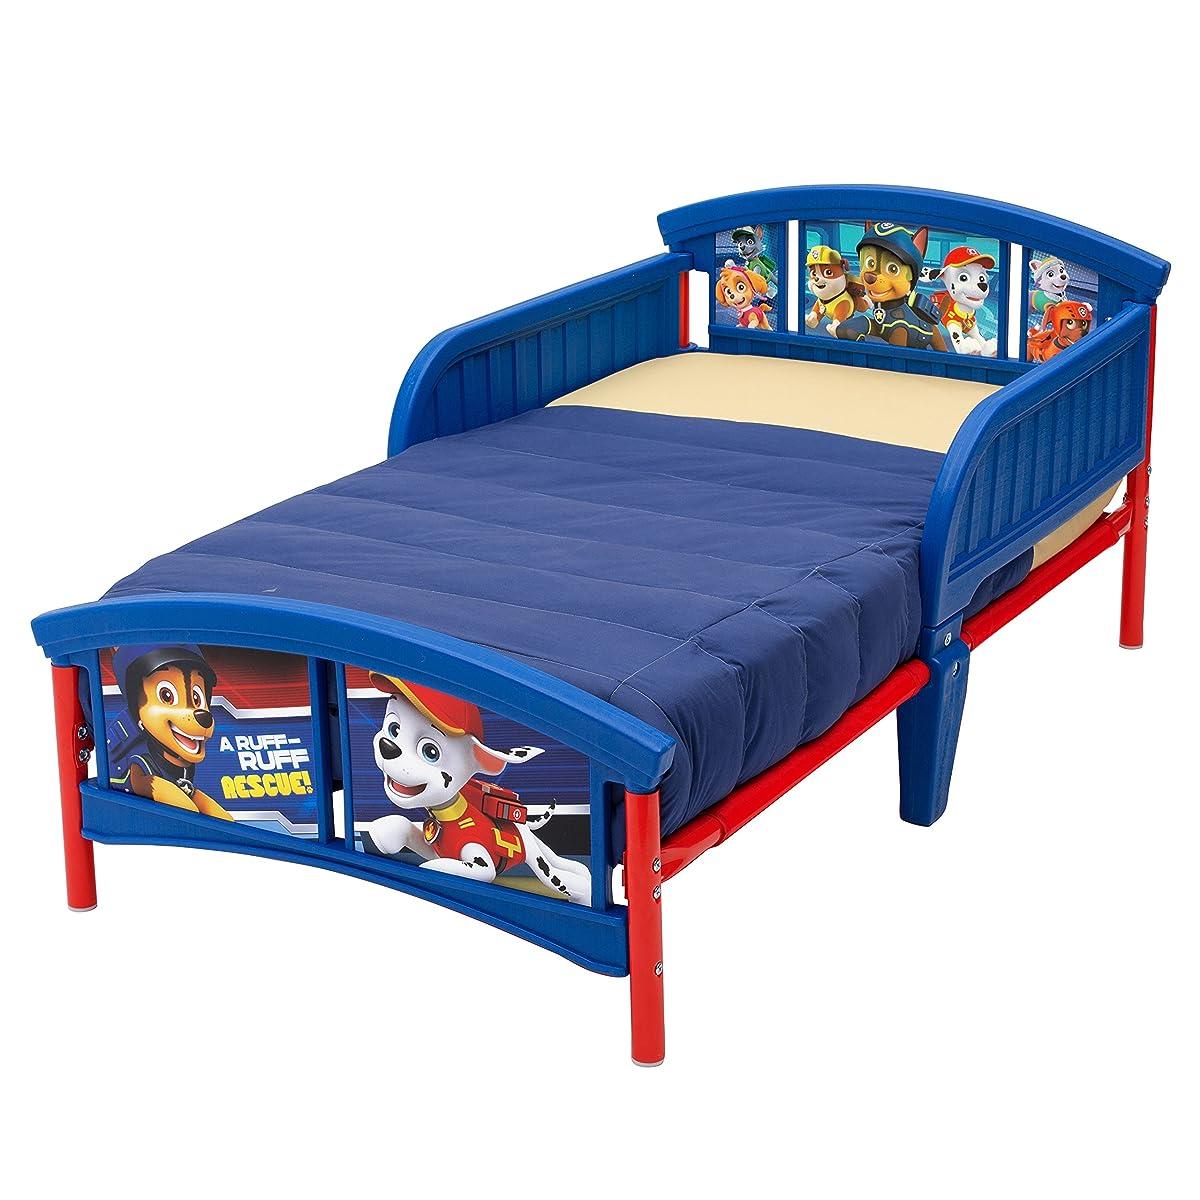 Delta Children Plastic Toddler Bed, Nick Jr. PAW Patrol